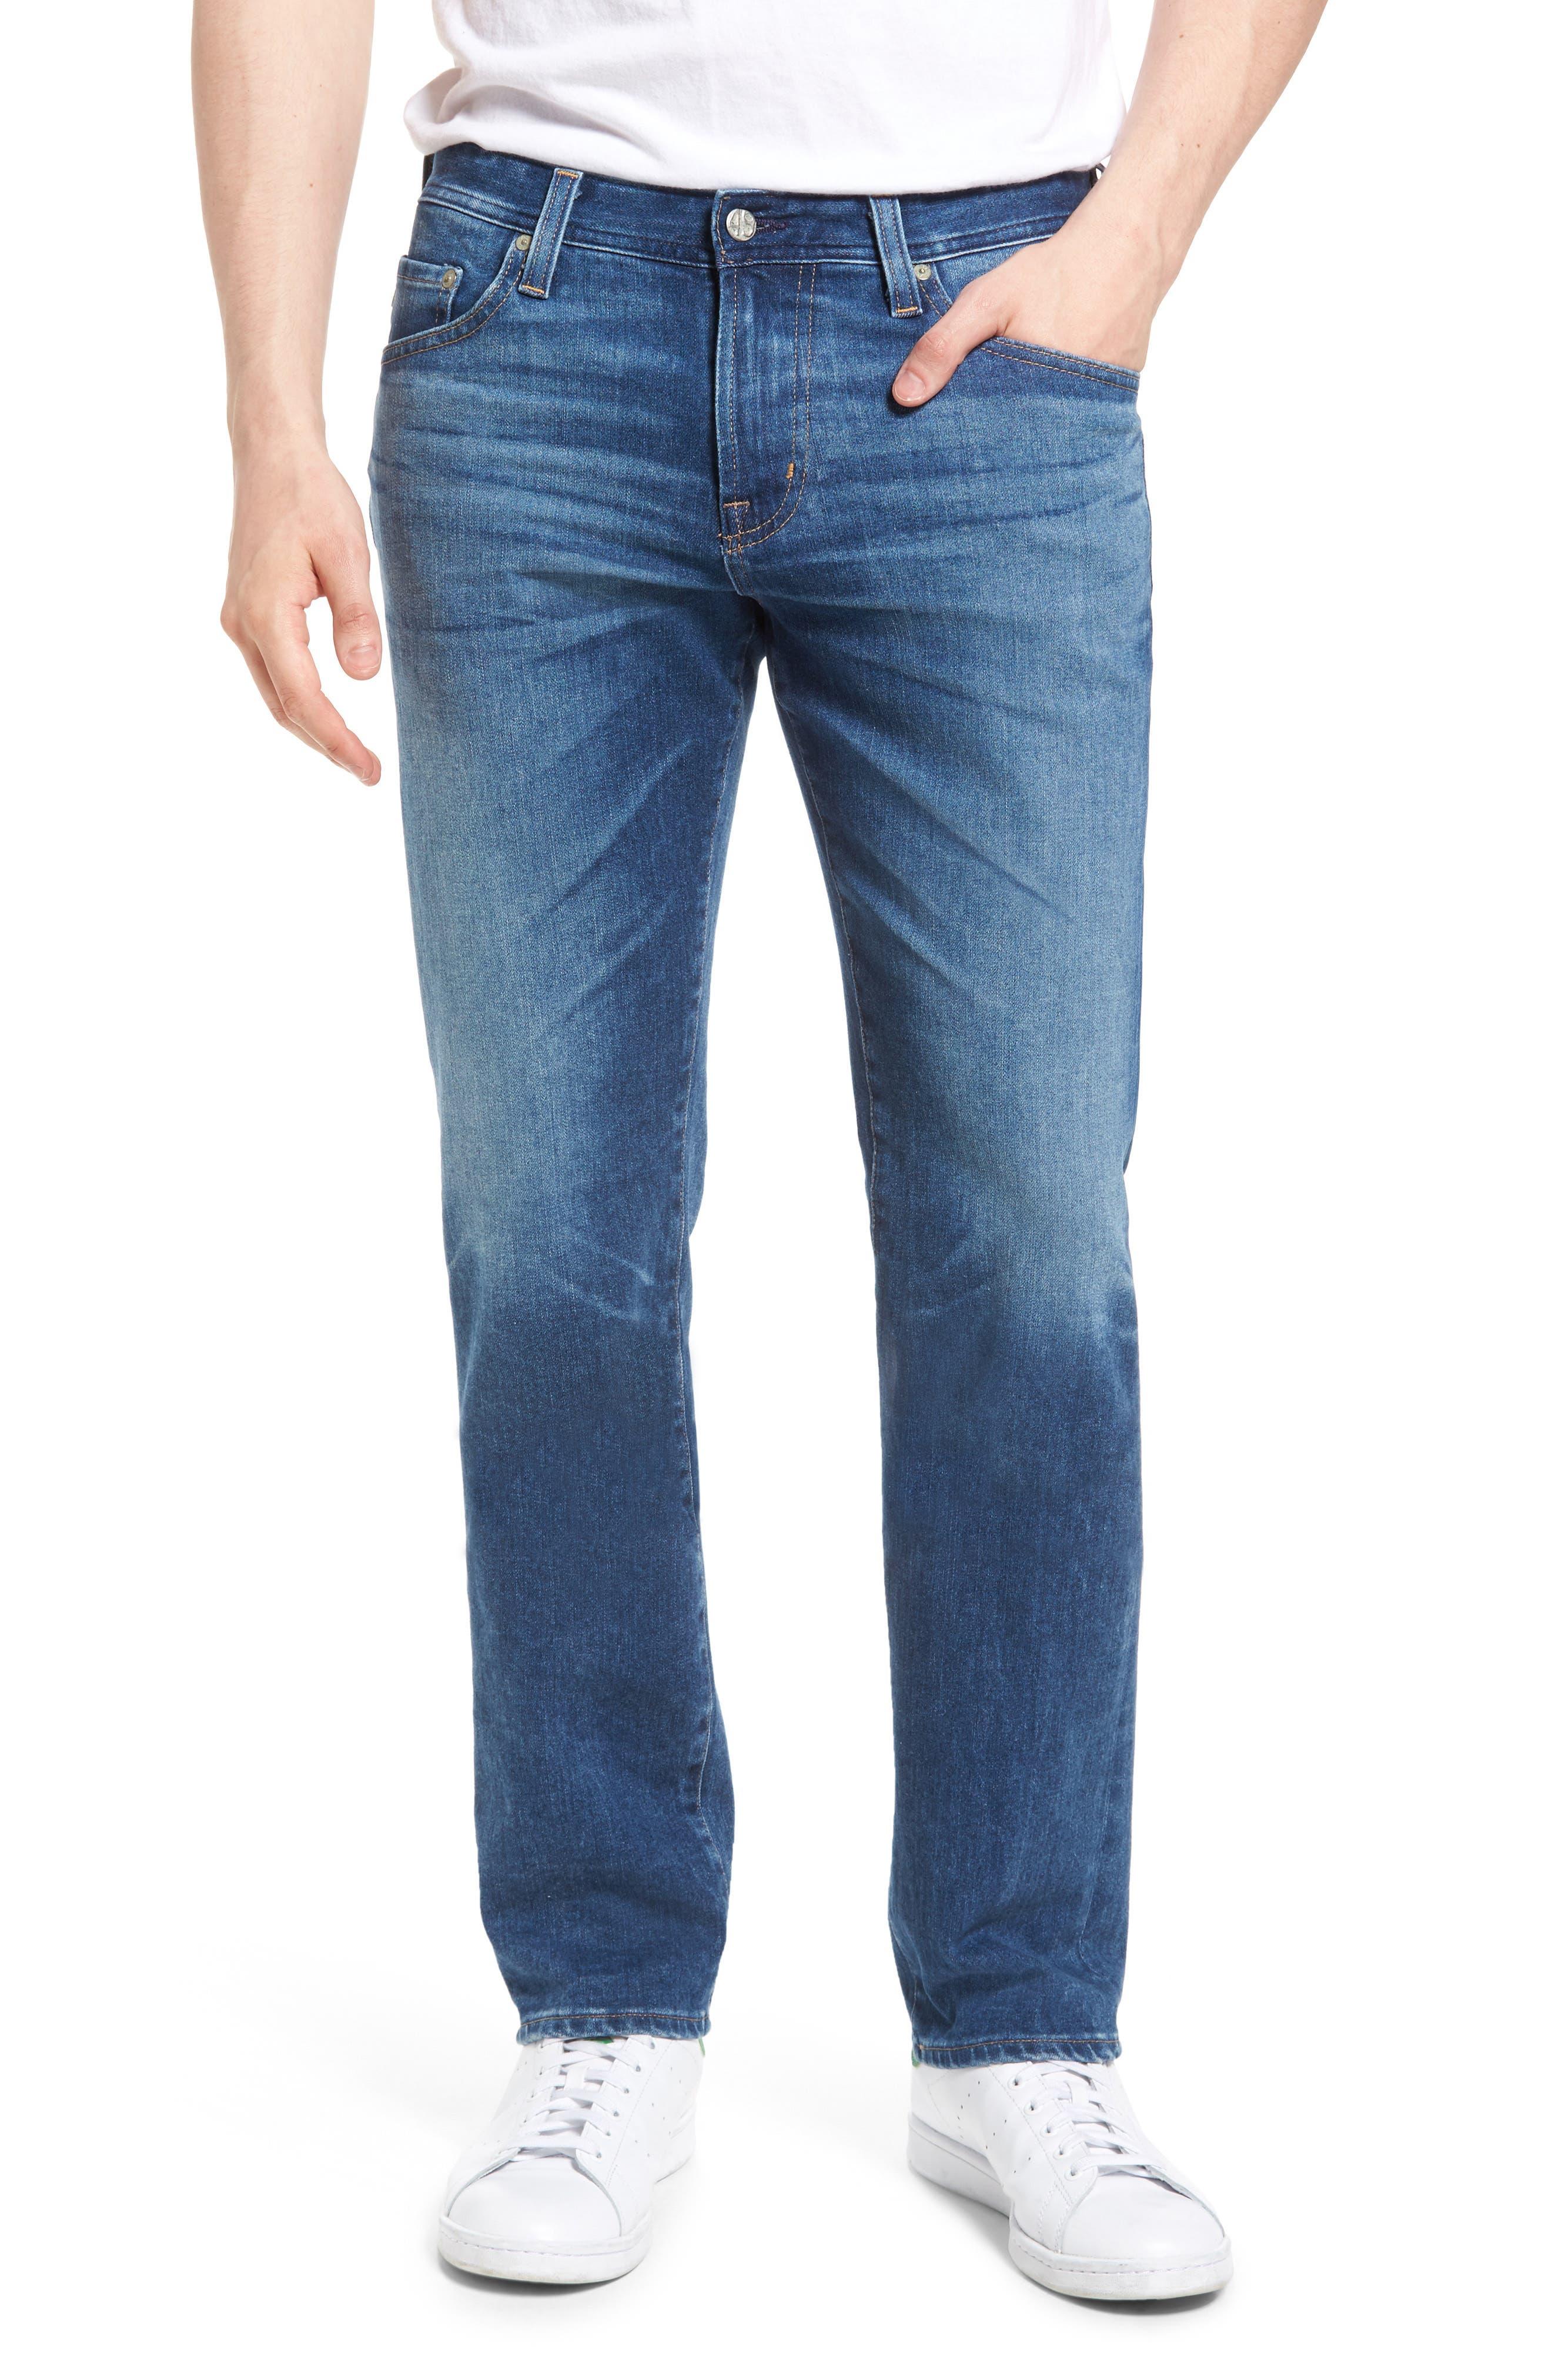 Graduate Slim Straight Leg Jeans,                             Main thumbnail 1, color,                             450